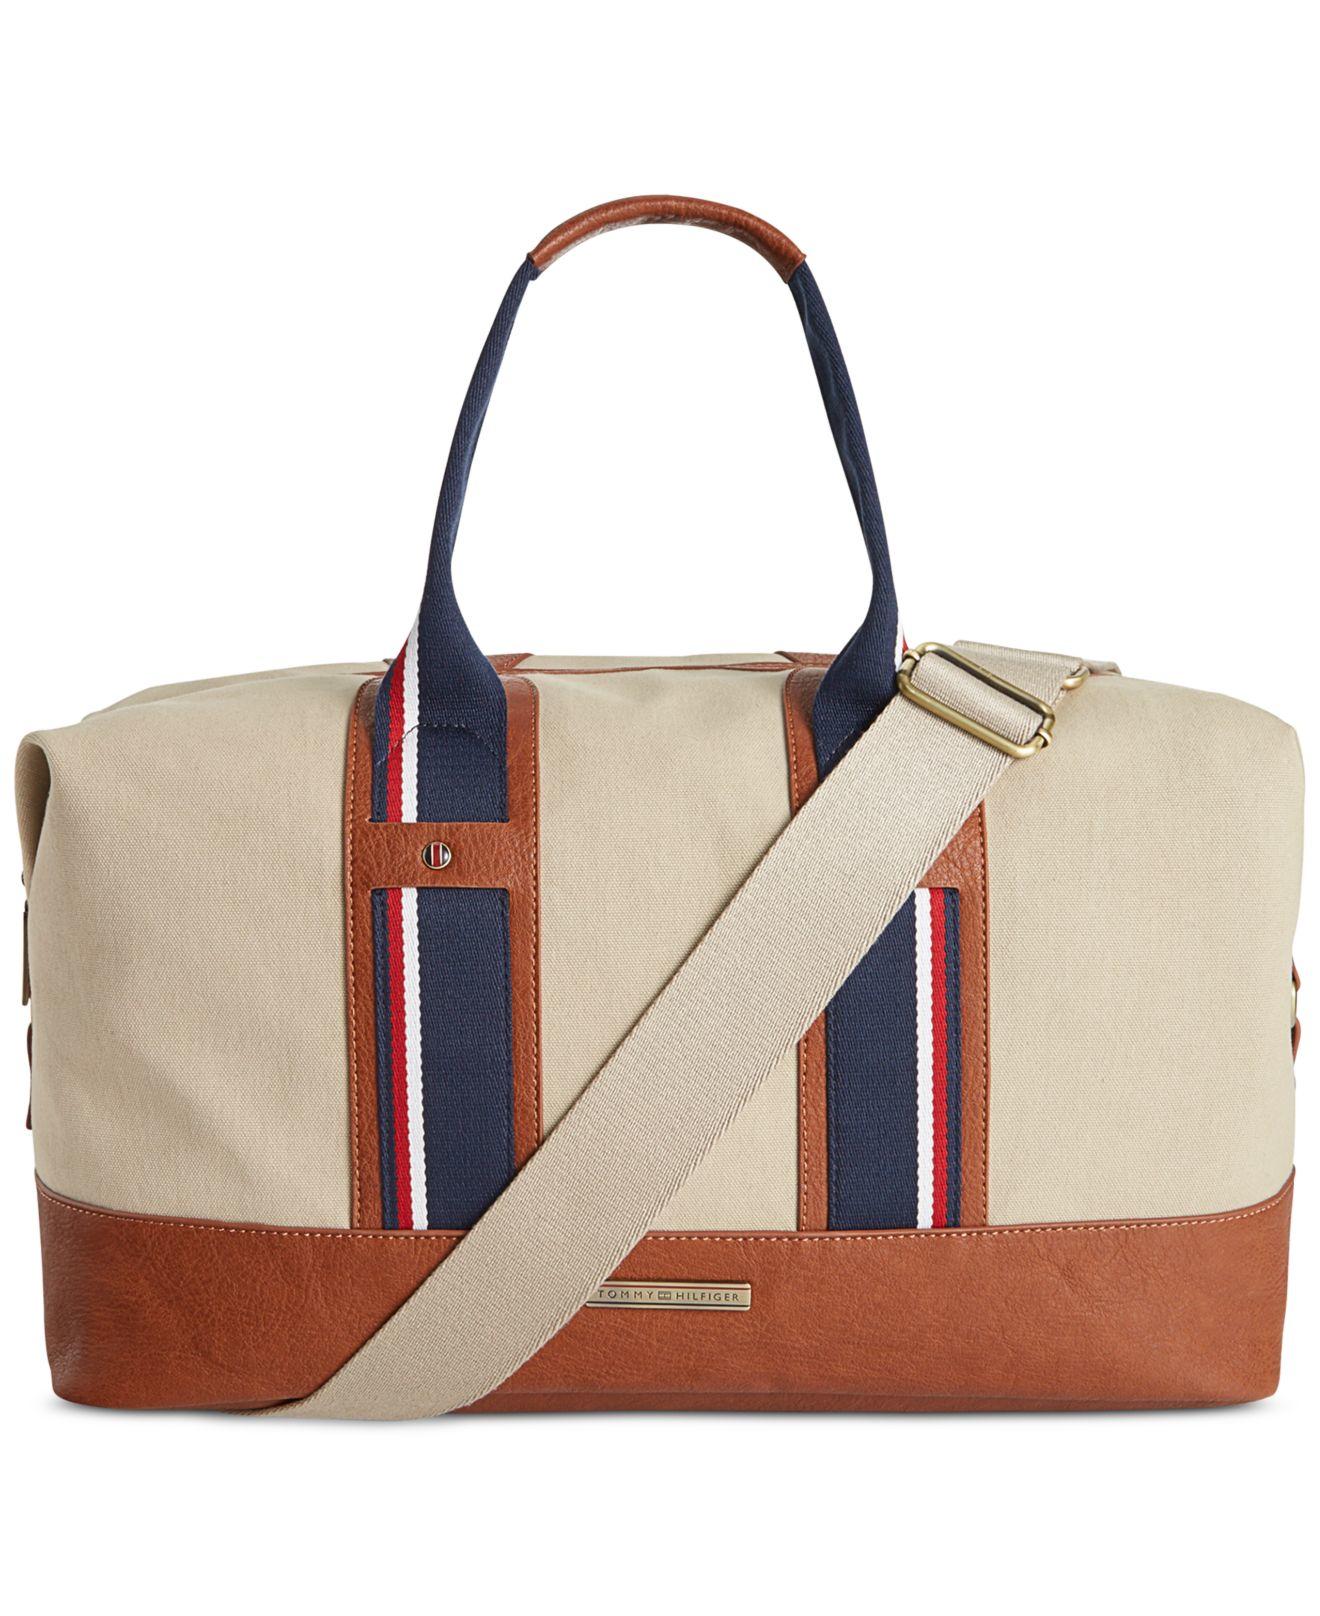 Lyst - Tommy Hilfiger Connor Weekender Bag in Natural for Men ff9e1b54244e8